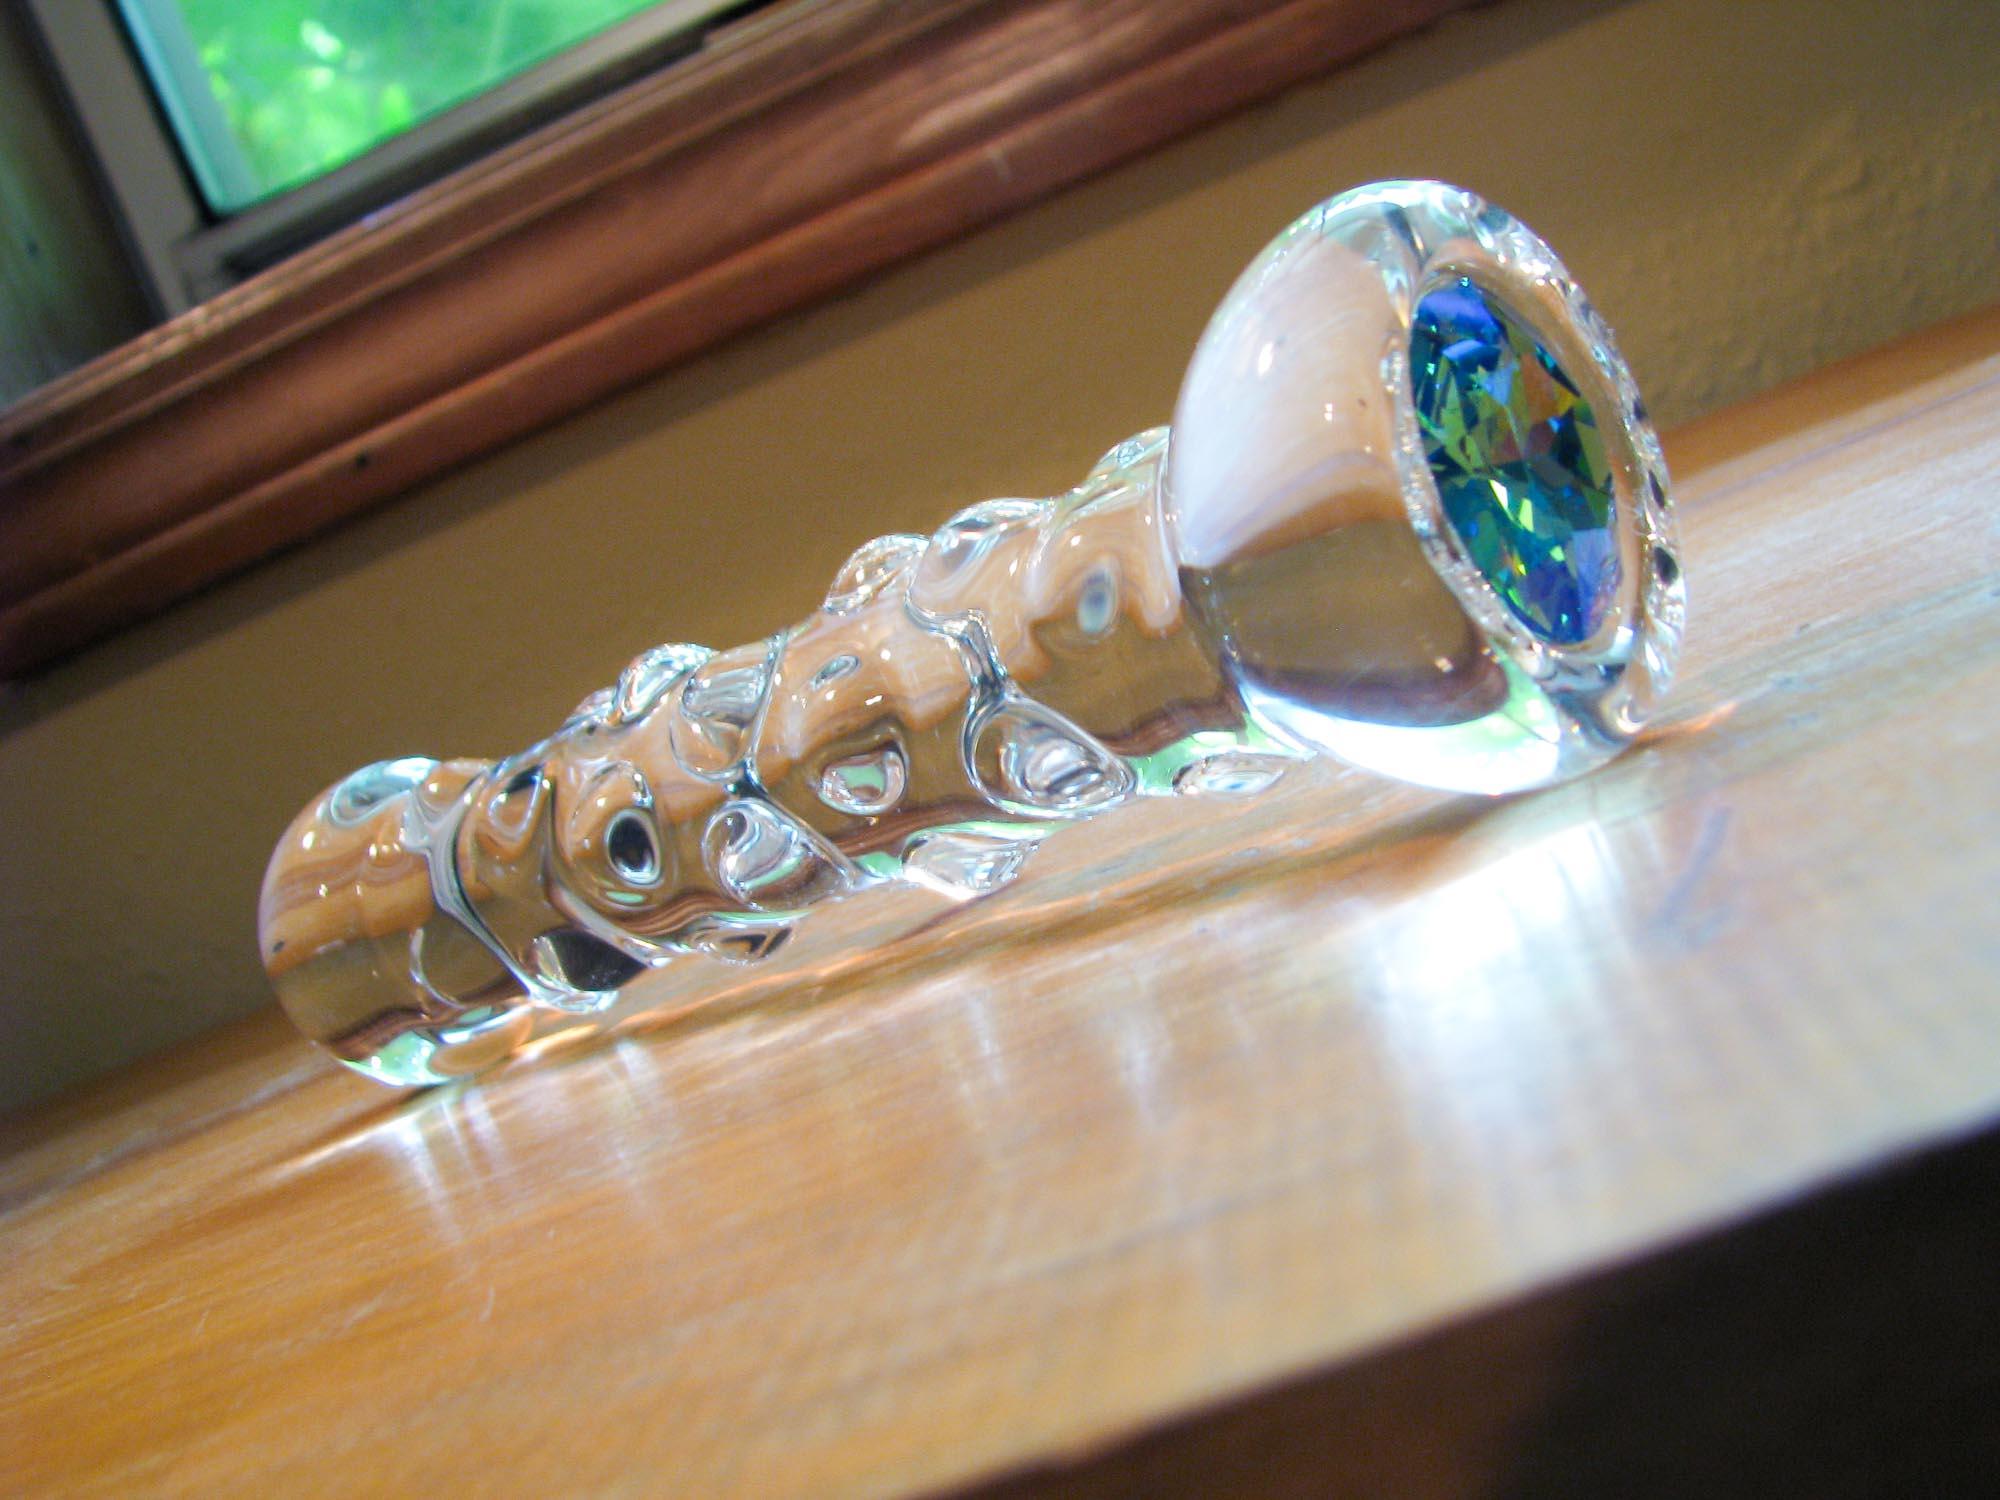 Crystal Delights Star Delight with glacier blue aqua Swarovski crystal on a wooden table.